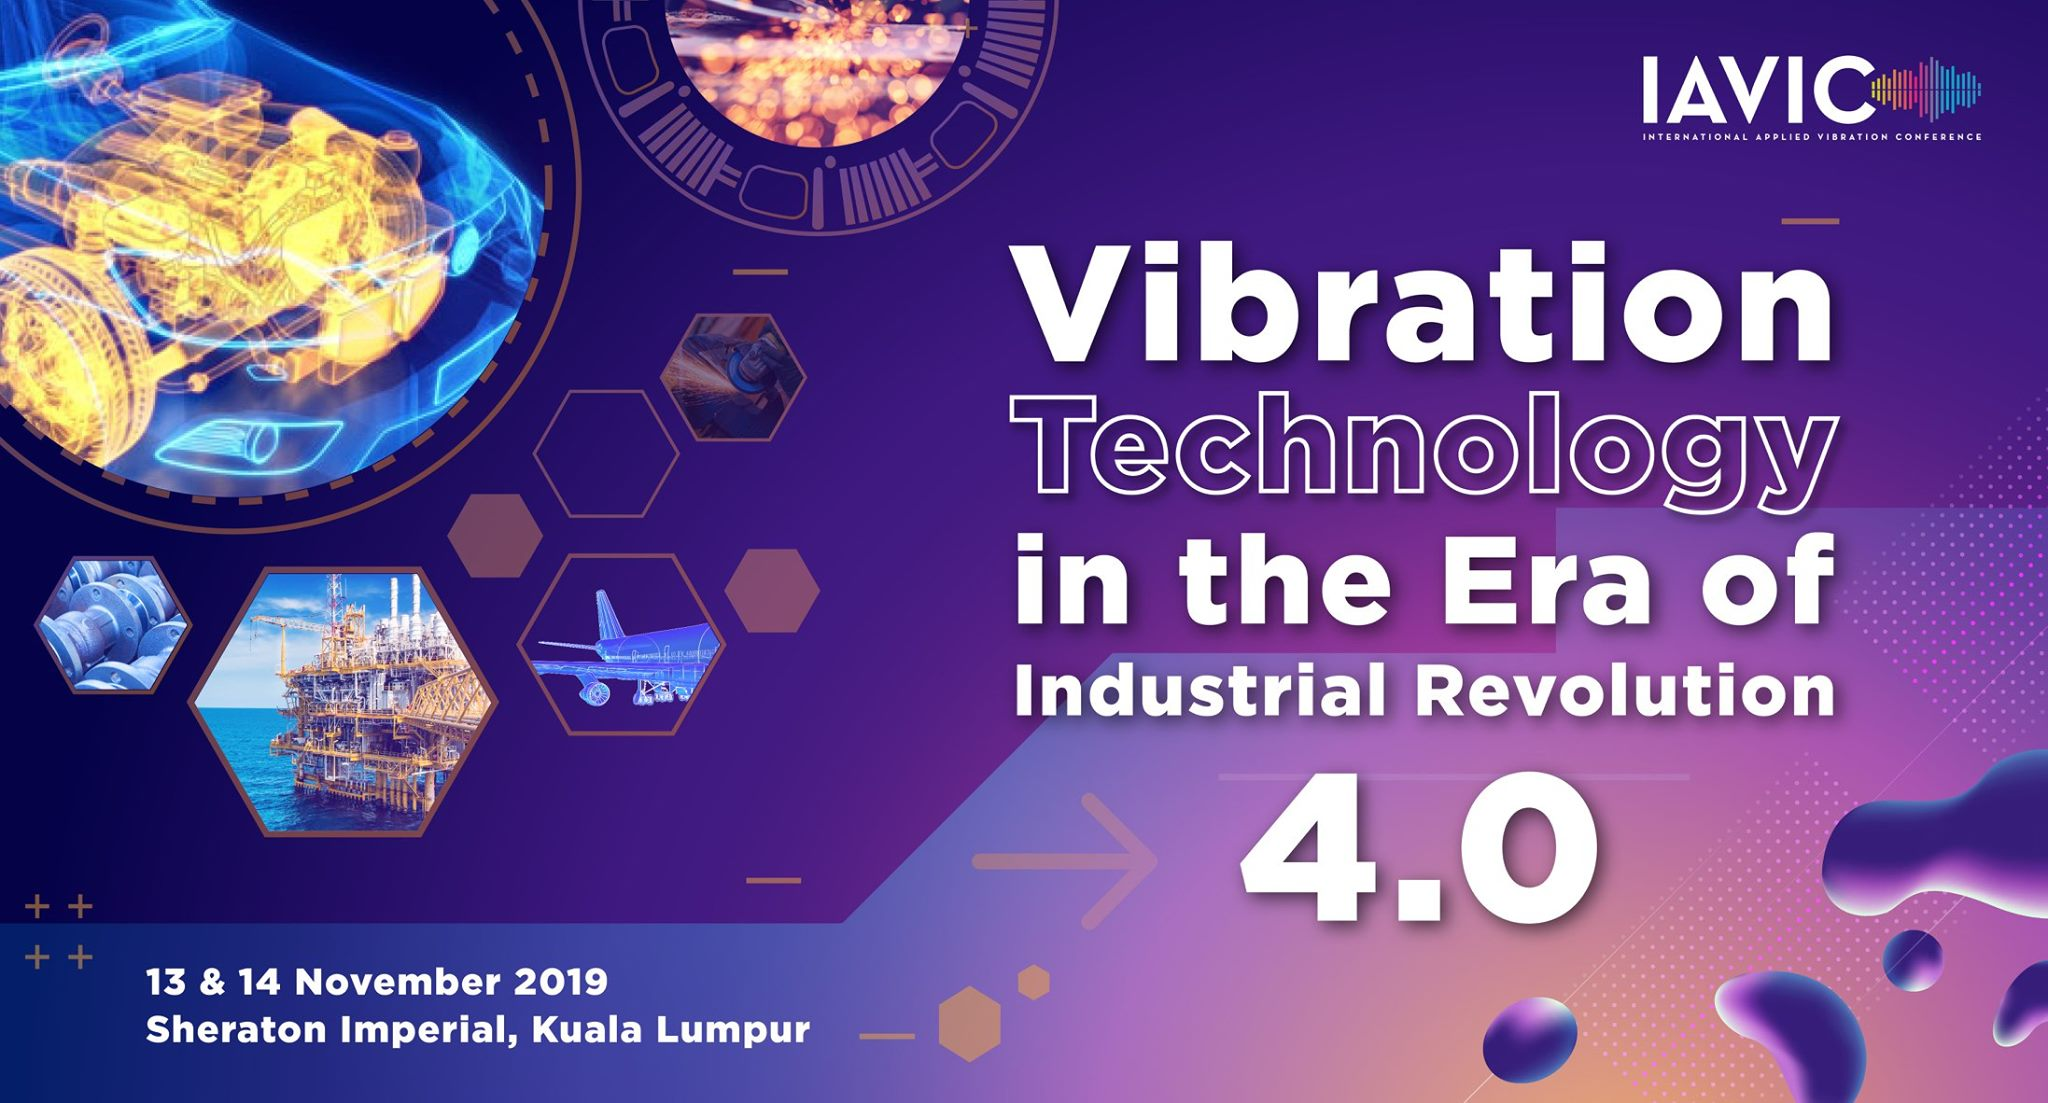 IAVIC 19′ : International Applied Vibration Conference